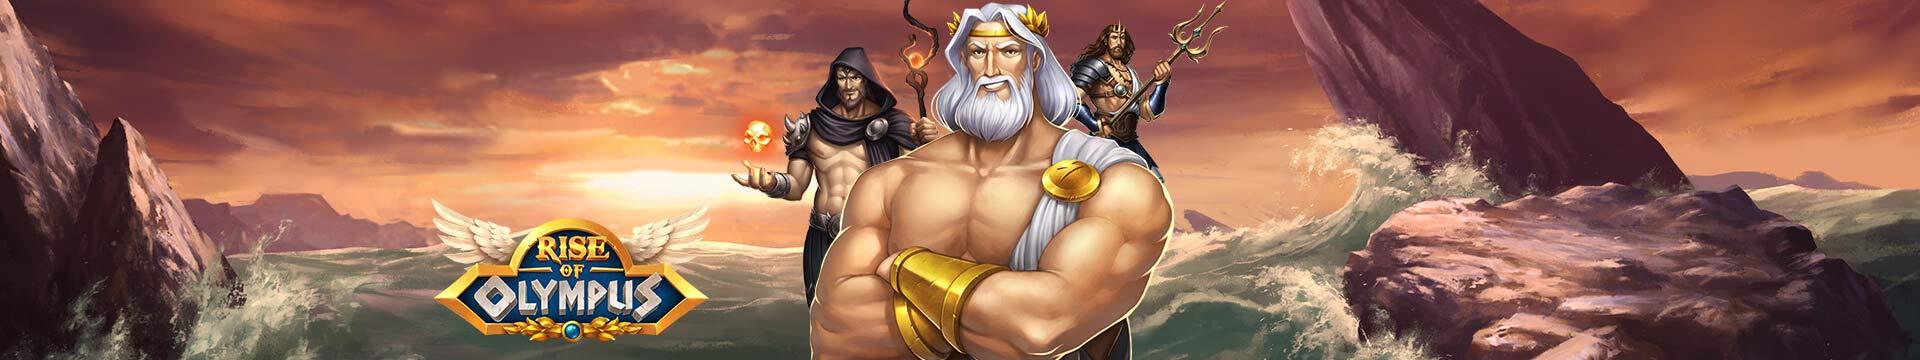 Slider Banner - Rise of Olympus